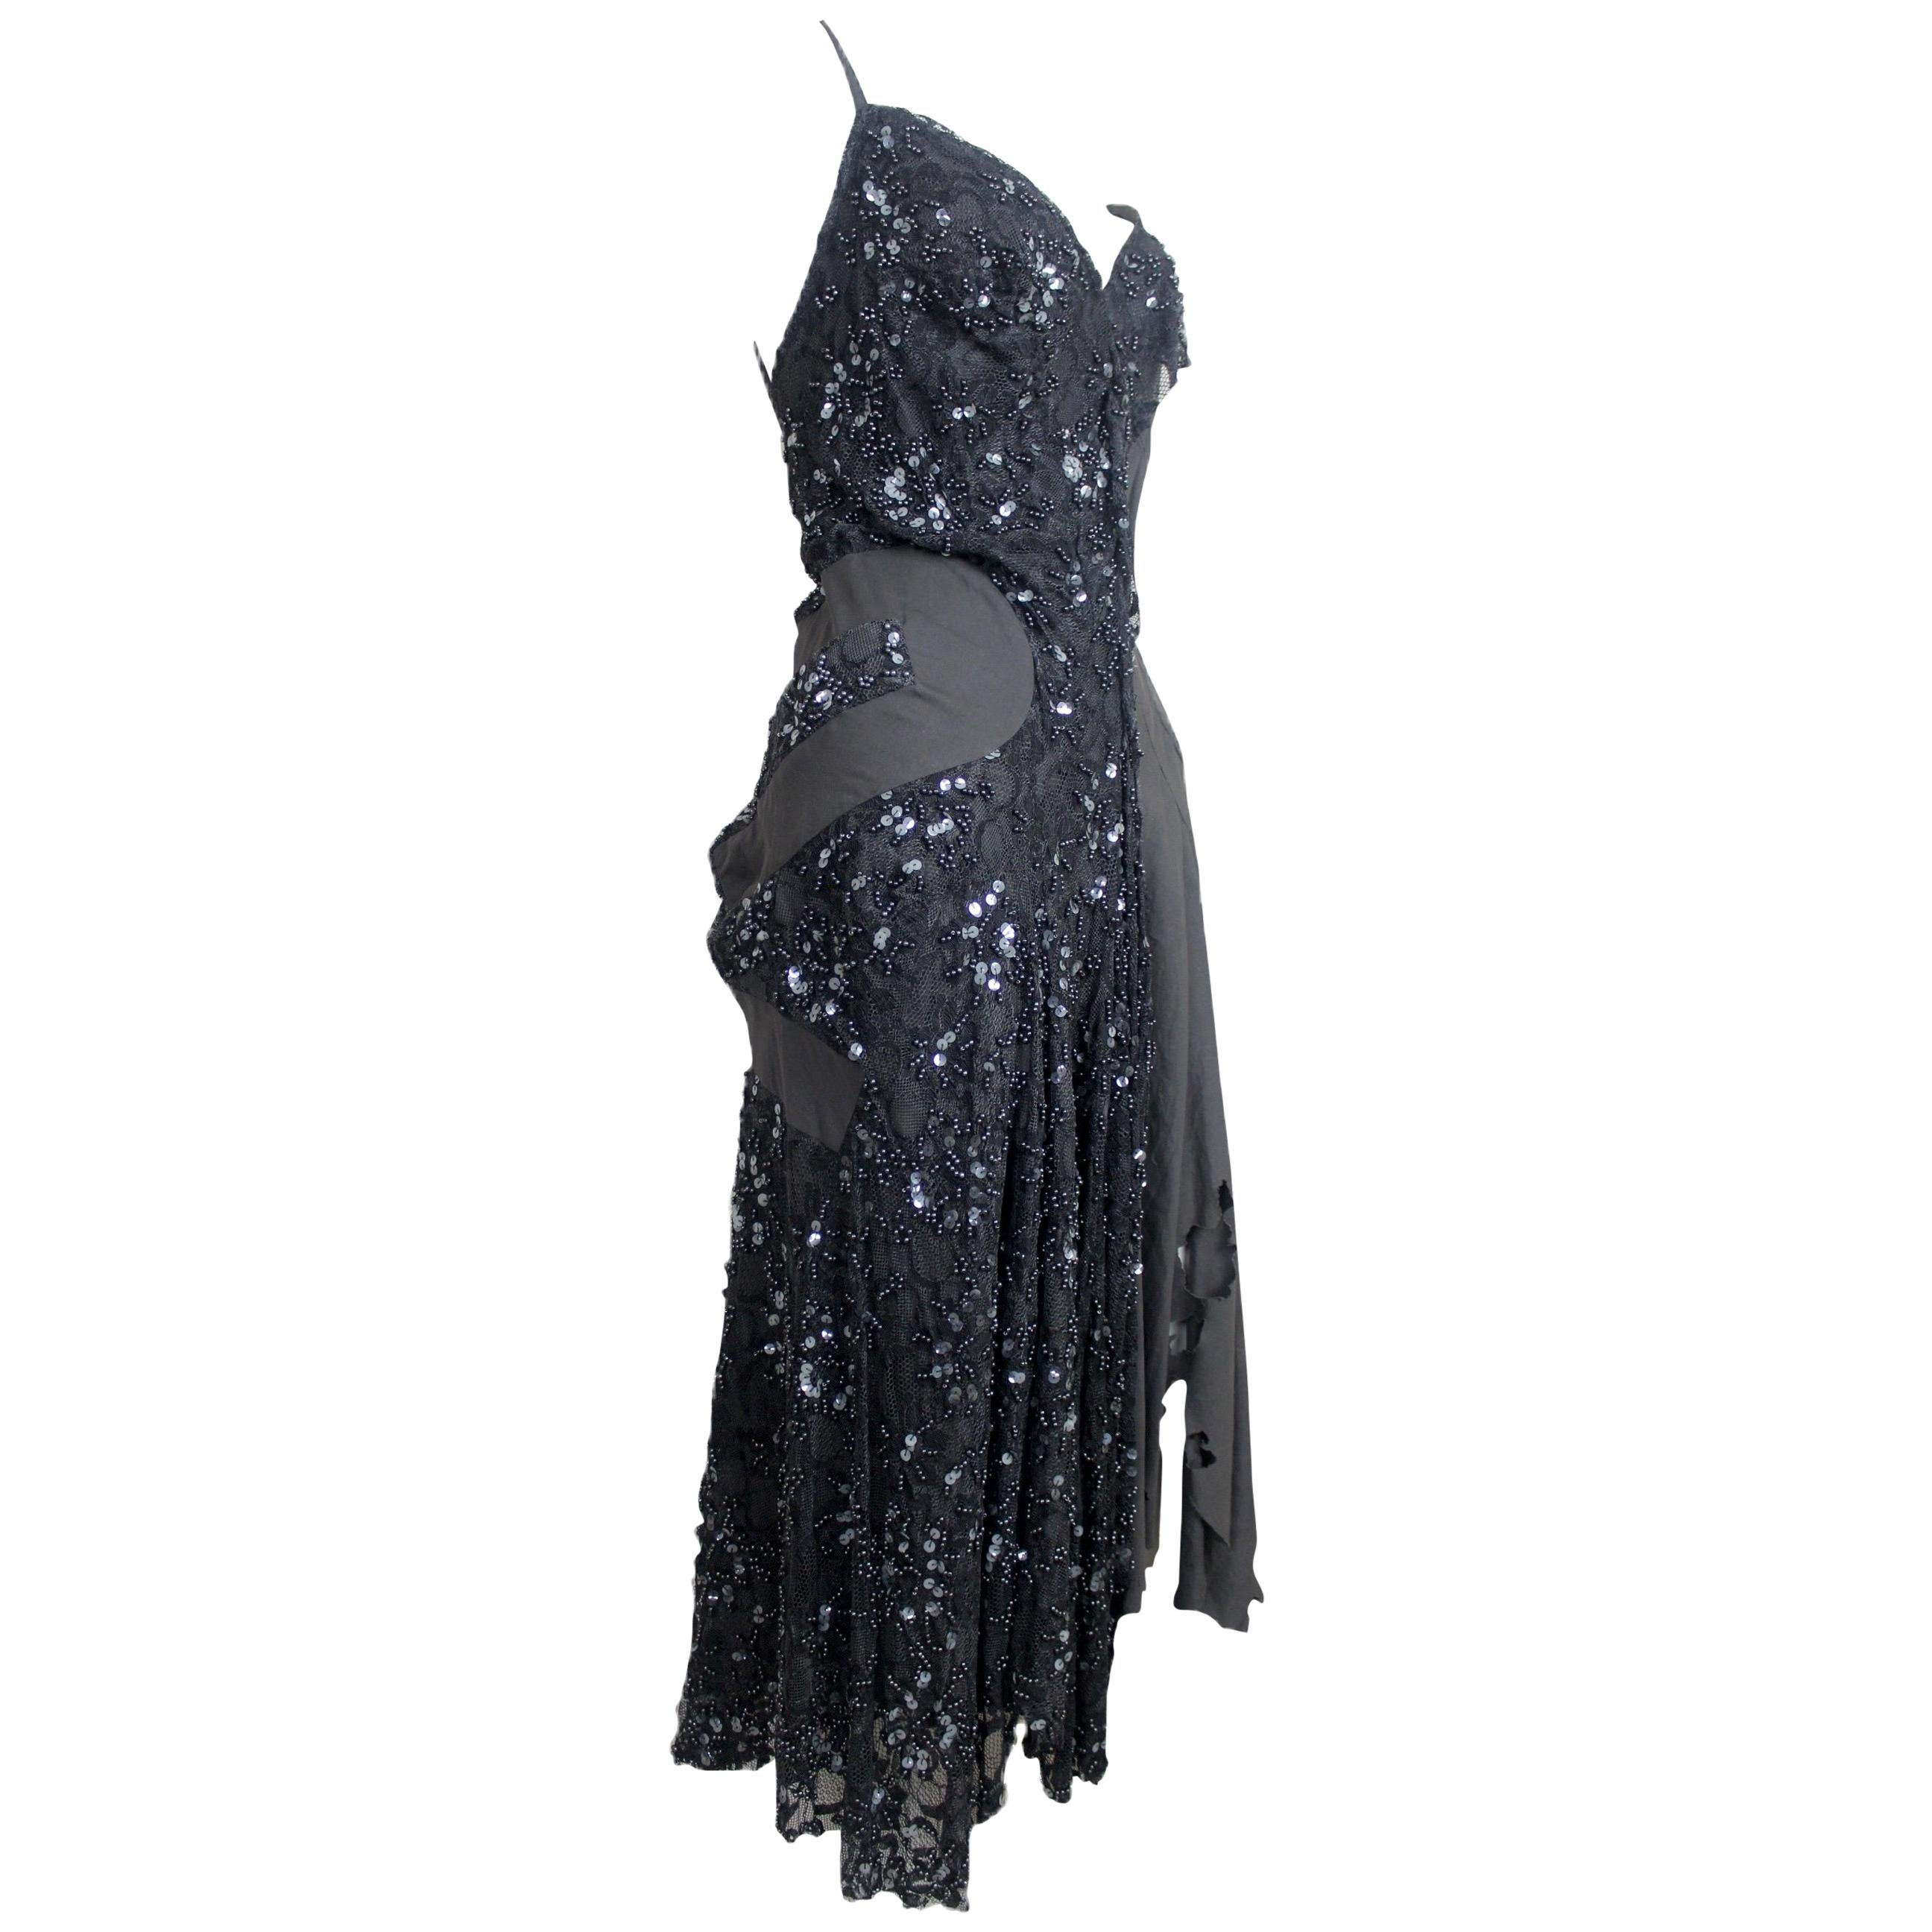 Junya Watanabe Comme des Garcons 2002 Collection Beaded Runway Dress